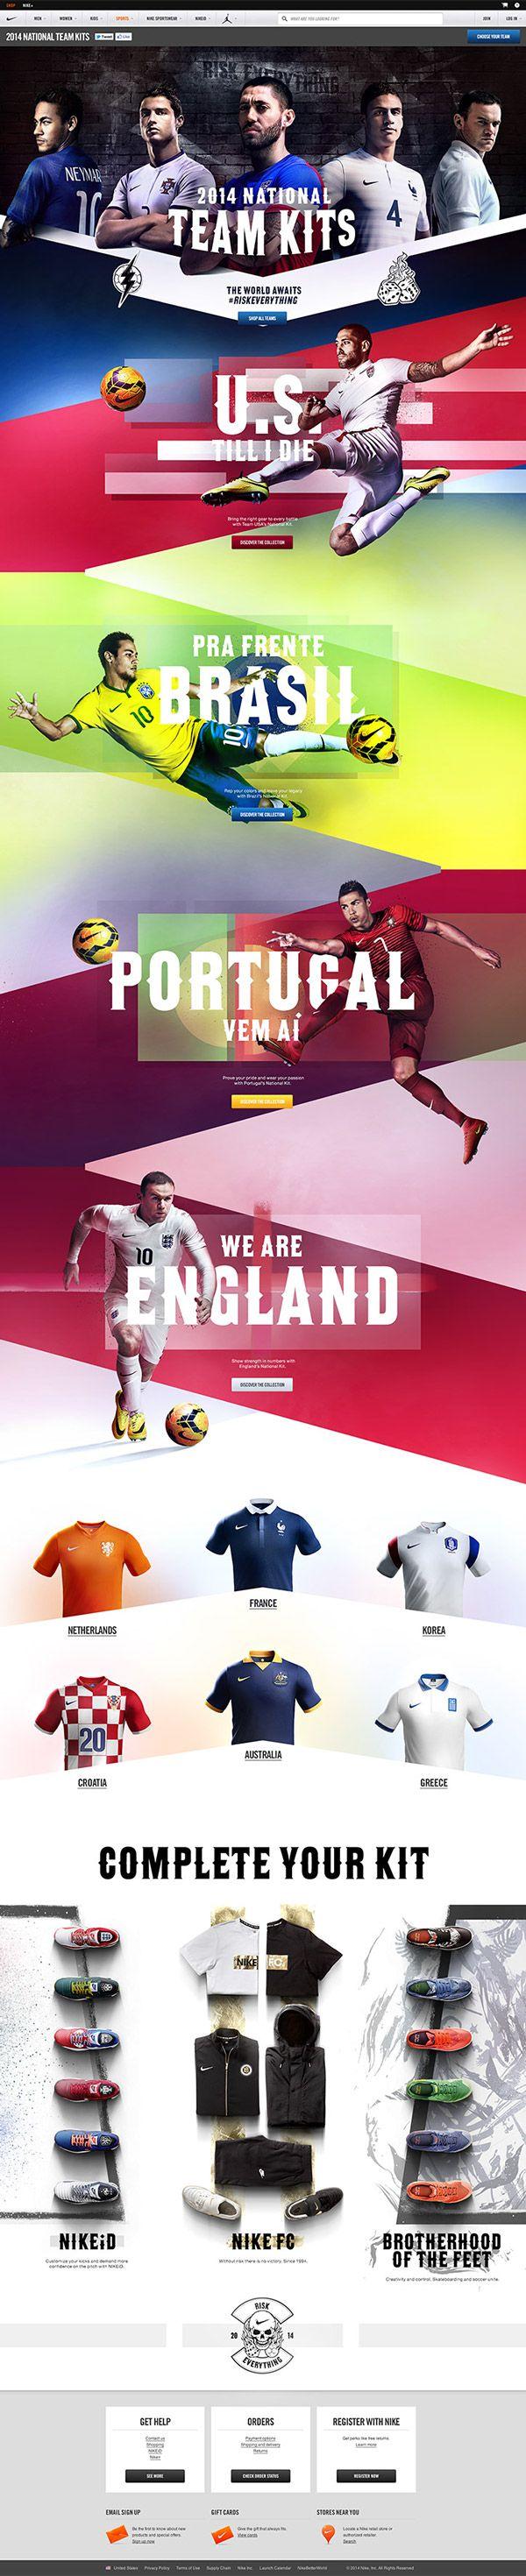 Nike National Team Kits 2014 on Behance